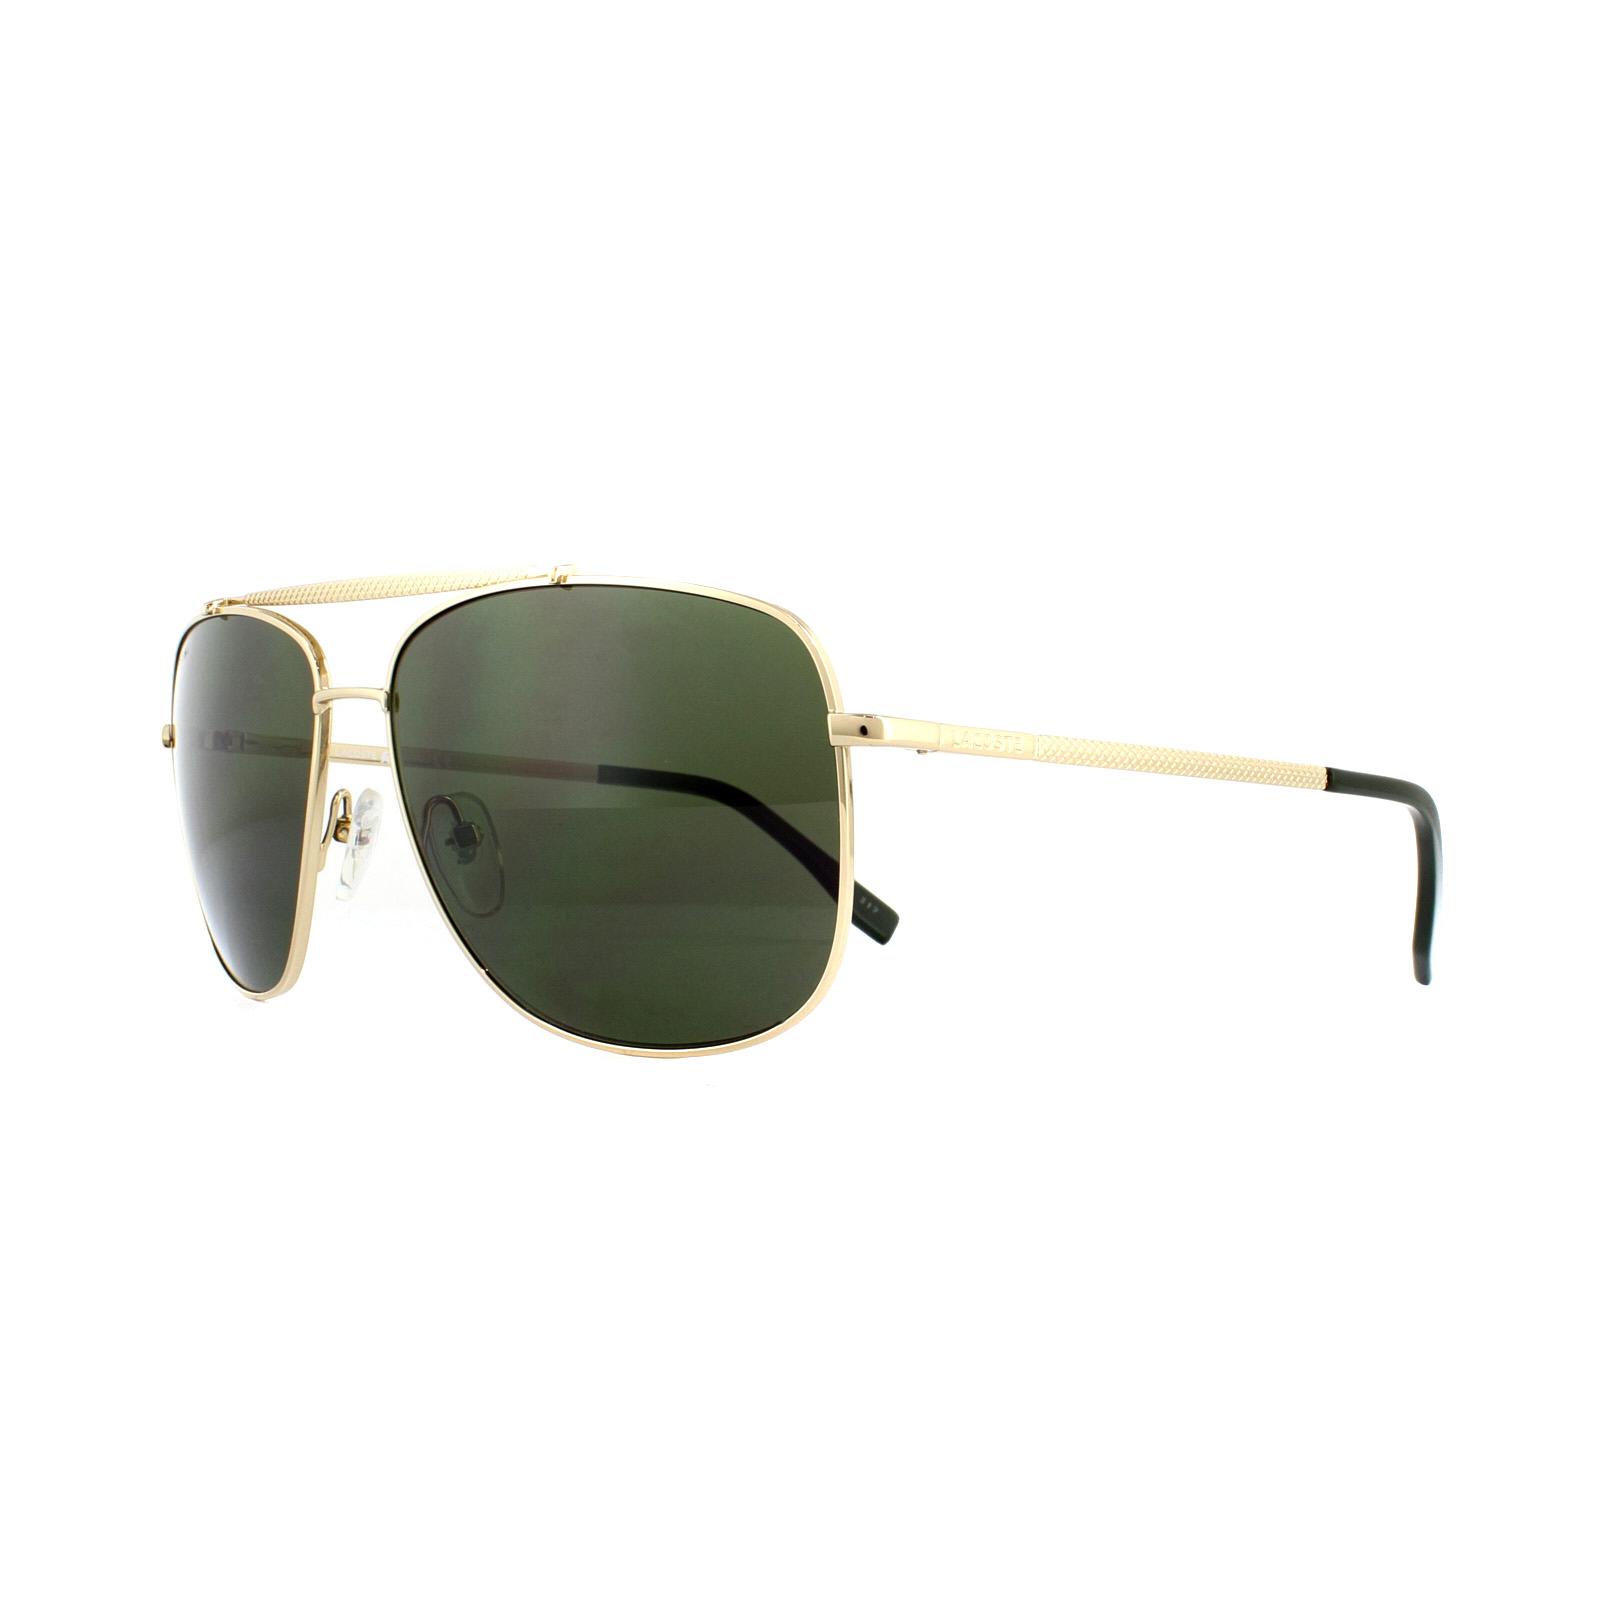 91c8c2d82a95 Lacoste Sunglasses L188S 714 Gold Green 886895290555